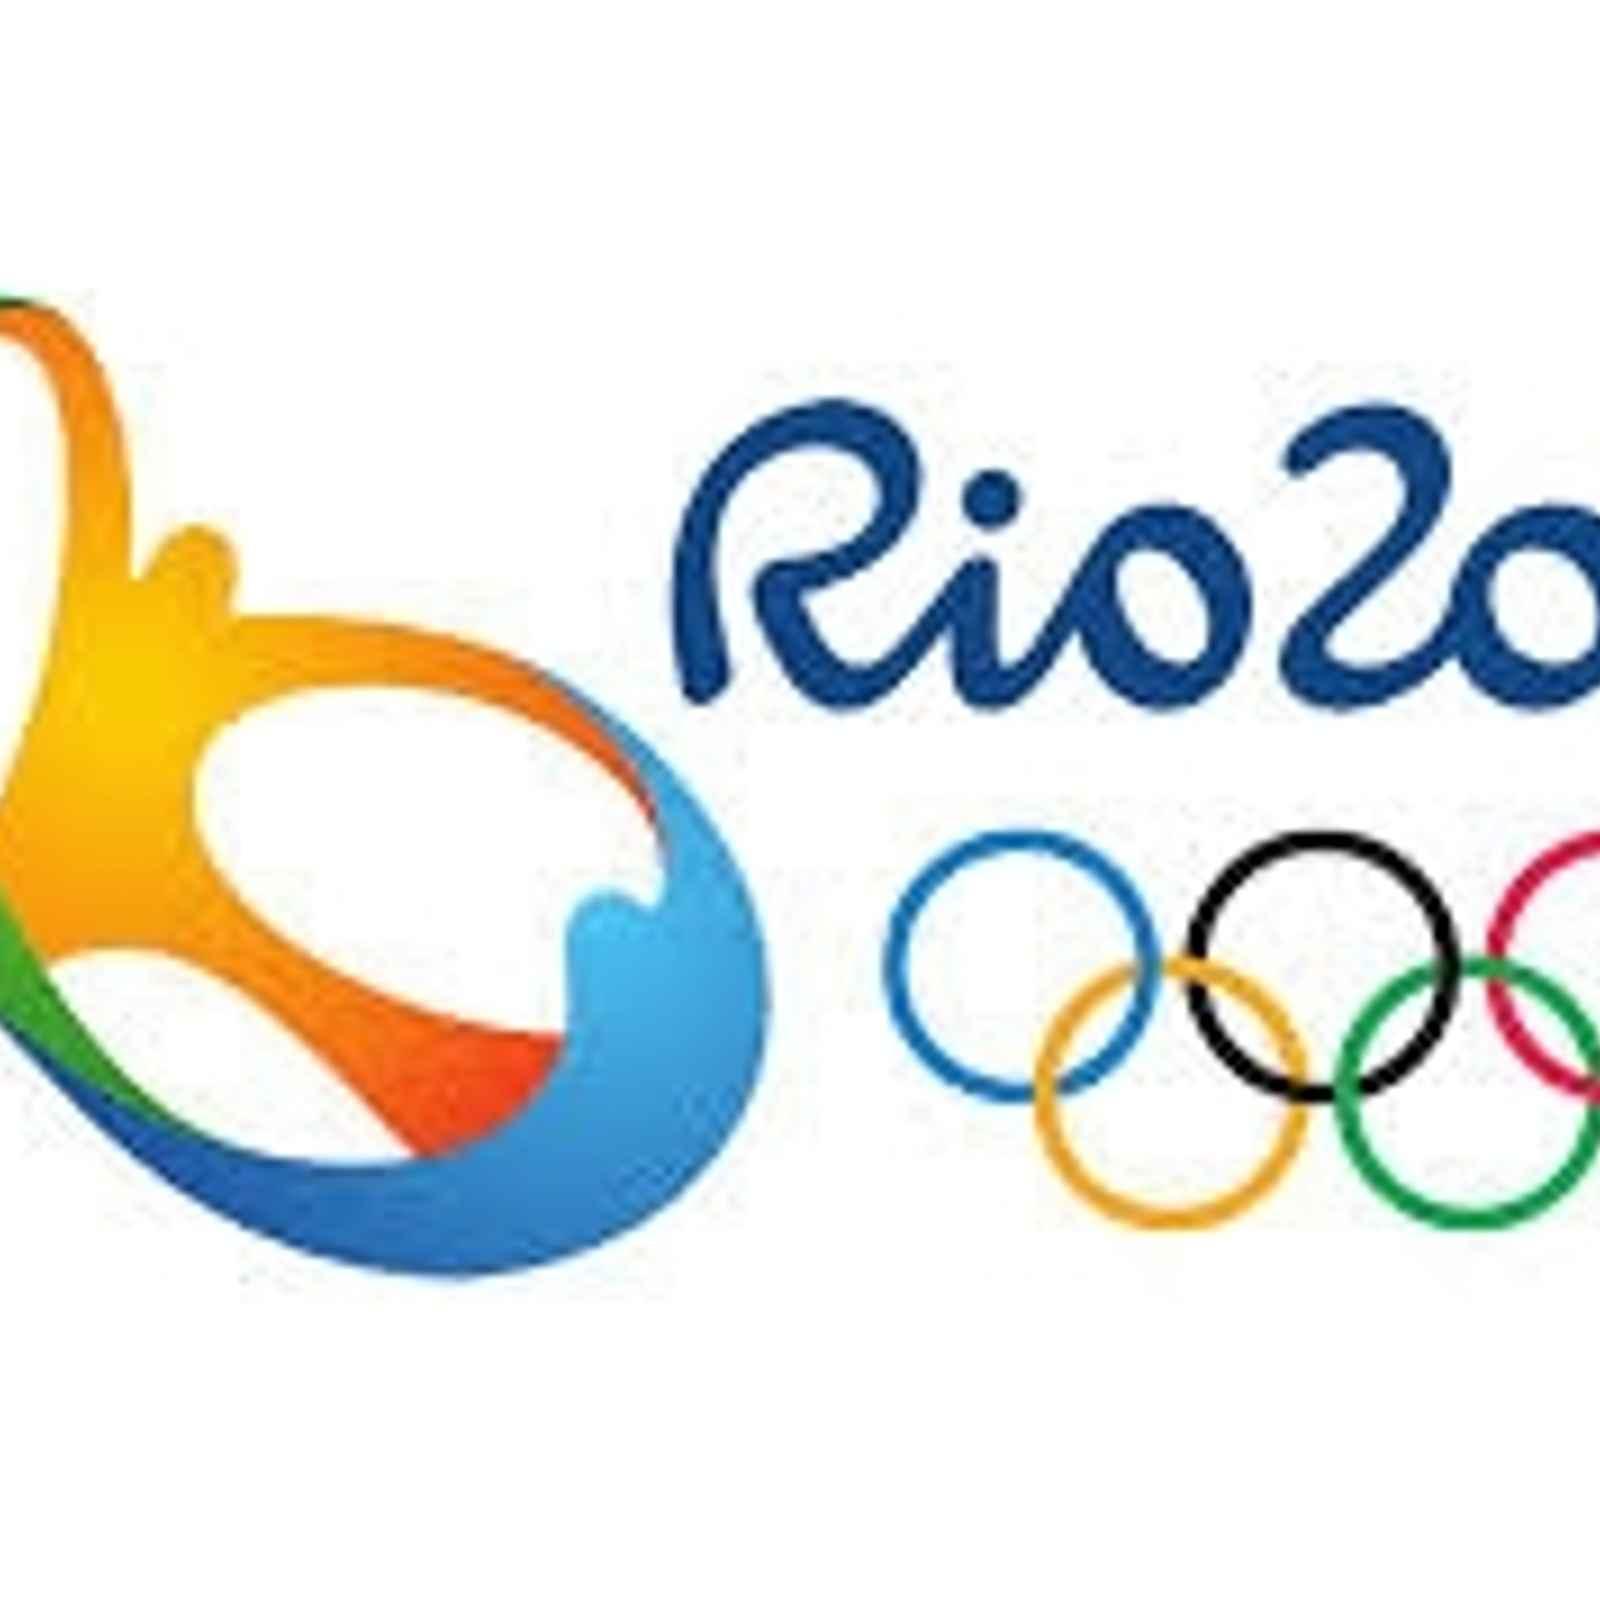 Men's Olympic Final Celebration event